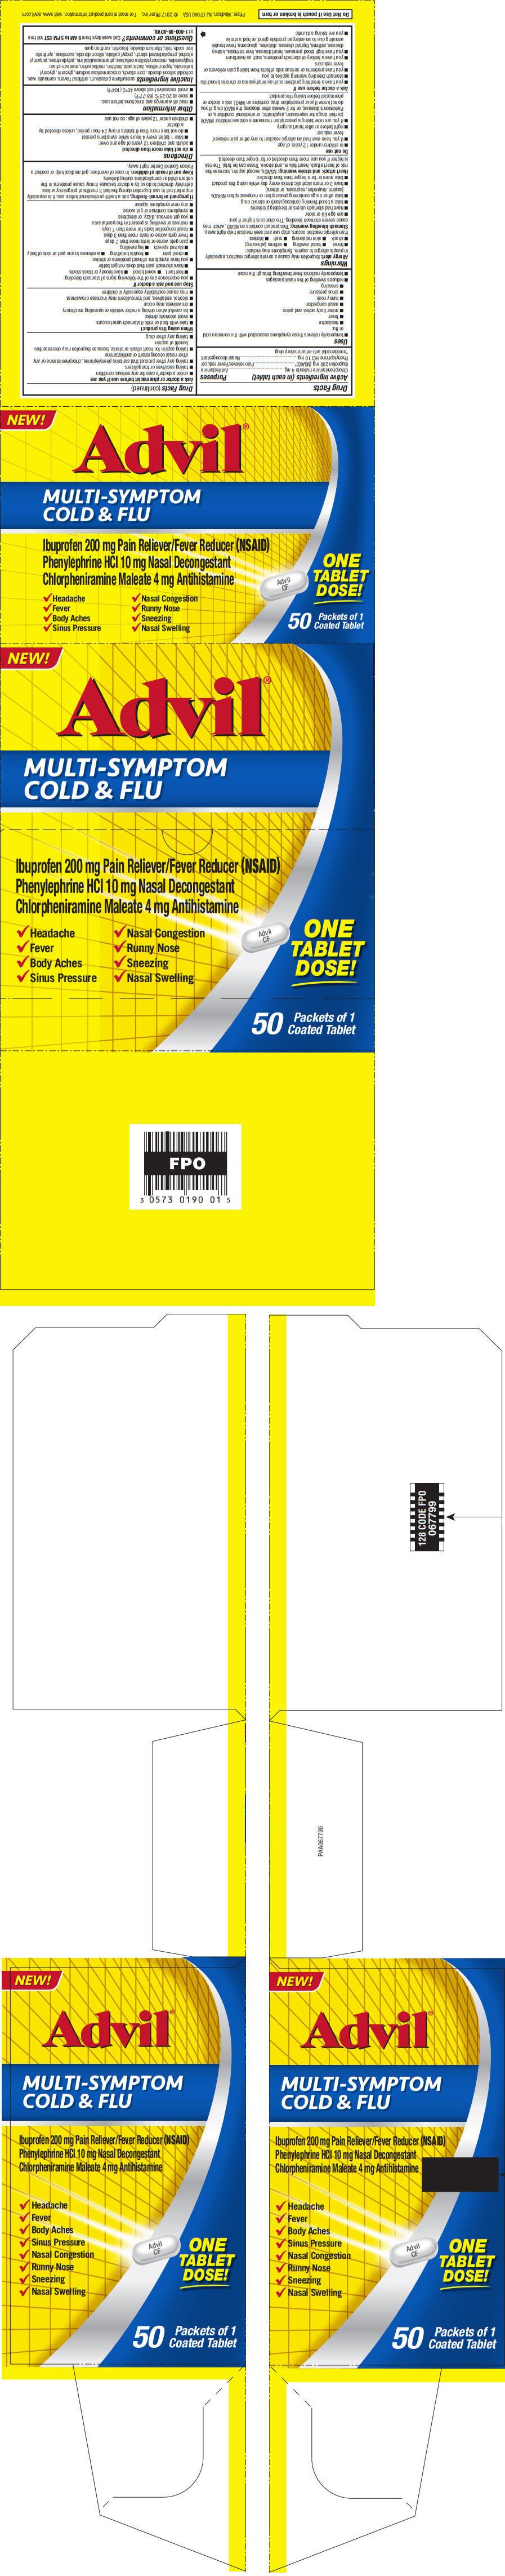 PRINCIPAL DISPLAY PANEL - 30 Tablet Blister Pack Carton